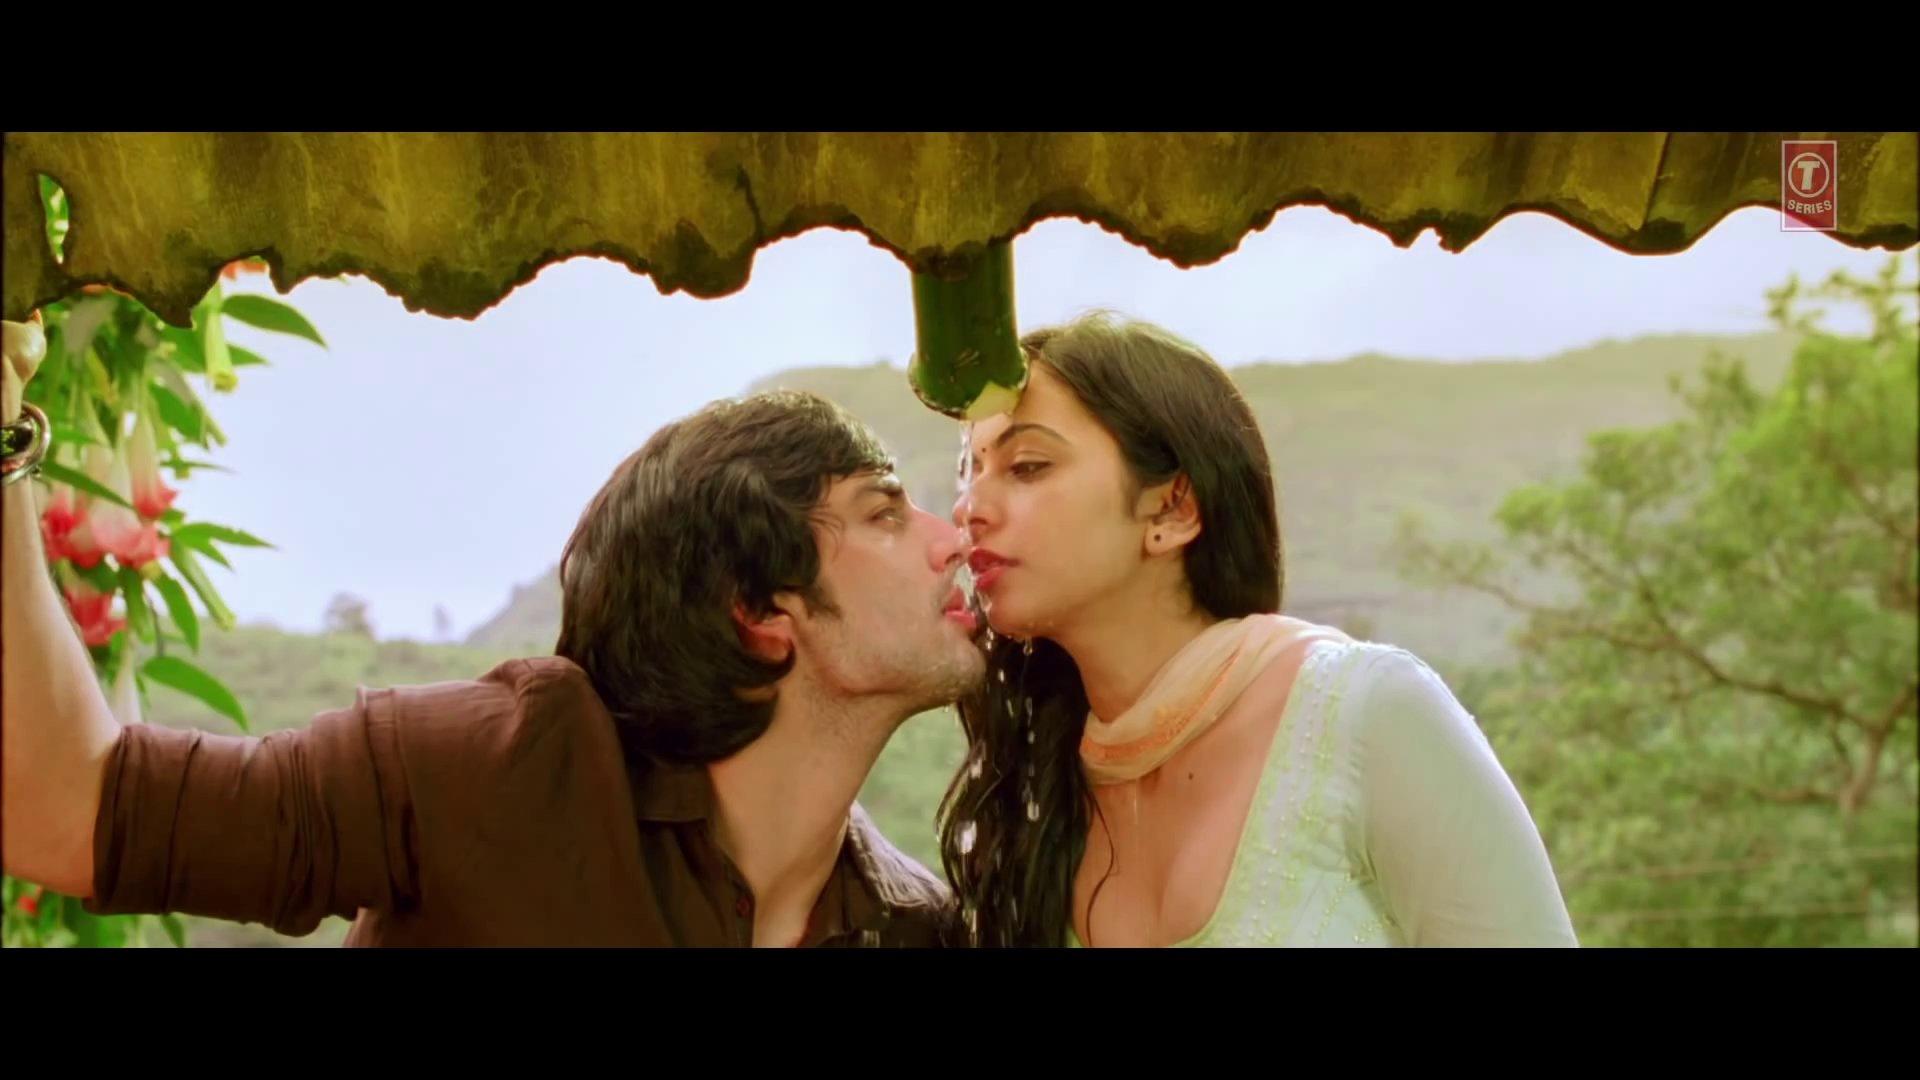 Hd wallpaper yaariyan - Yaariyan Drama Romance Bollywood 45 Wallpaper 1920x1080 378354 Wallpaperup